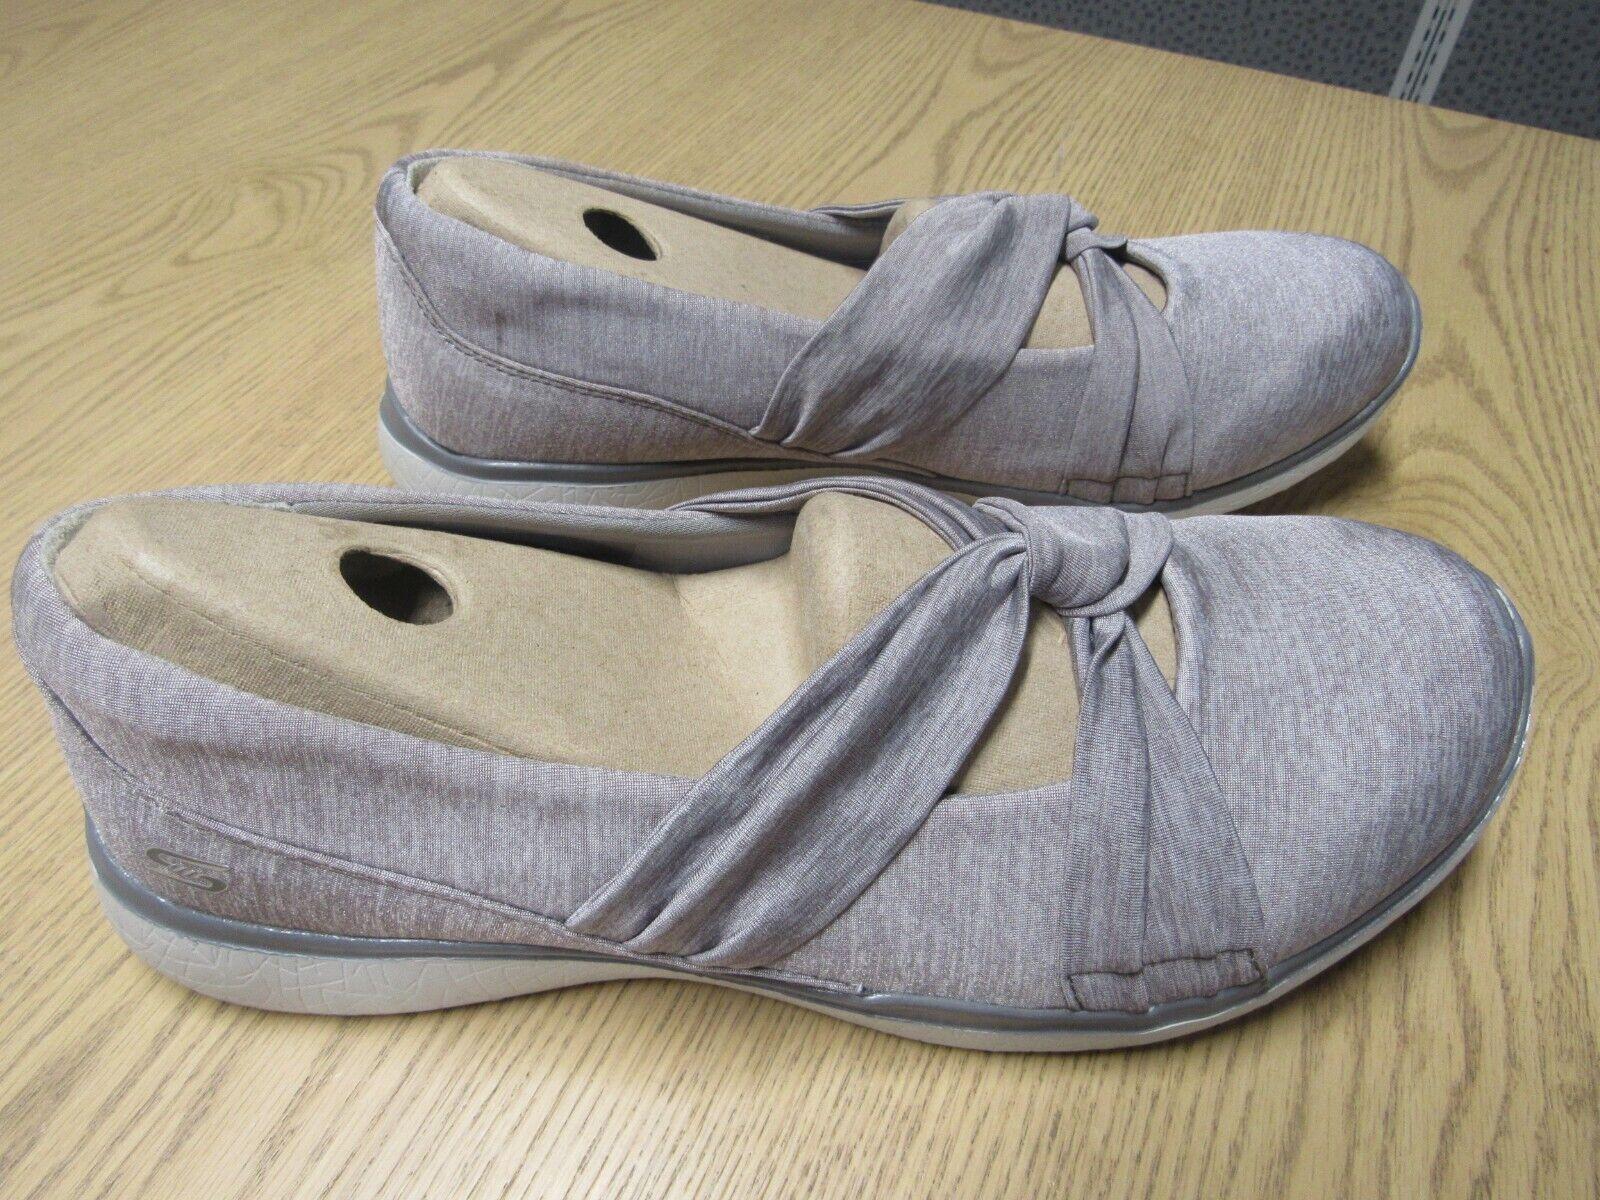 Skechers Heathered Jersey Mary Jane Gray shoes Women's 6